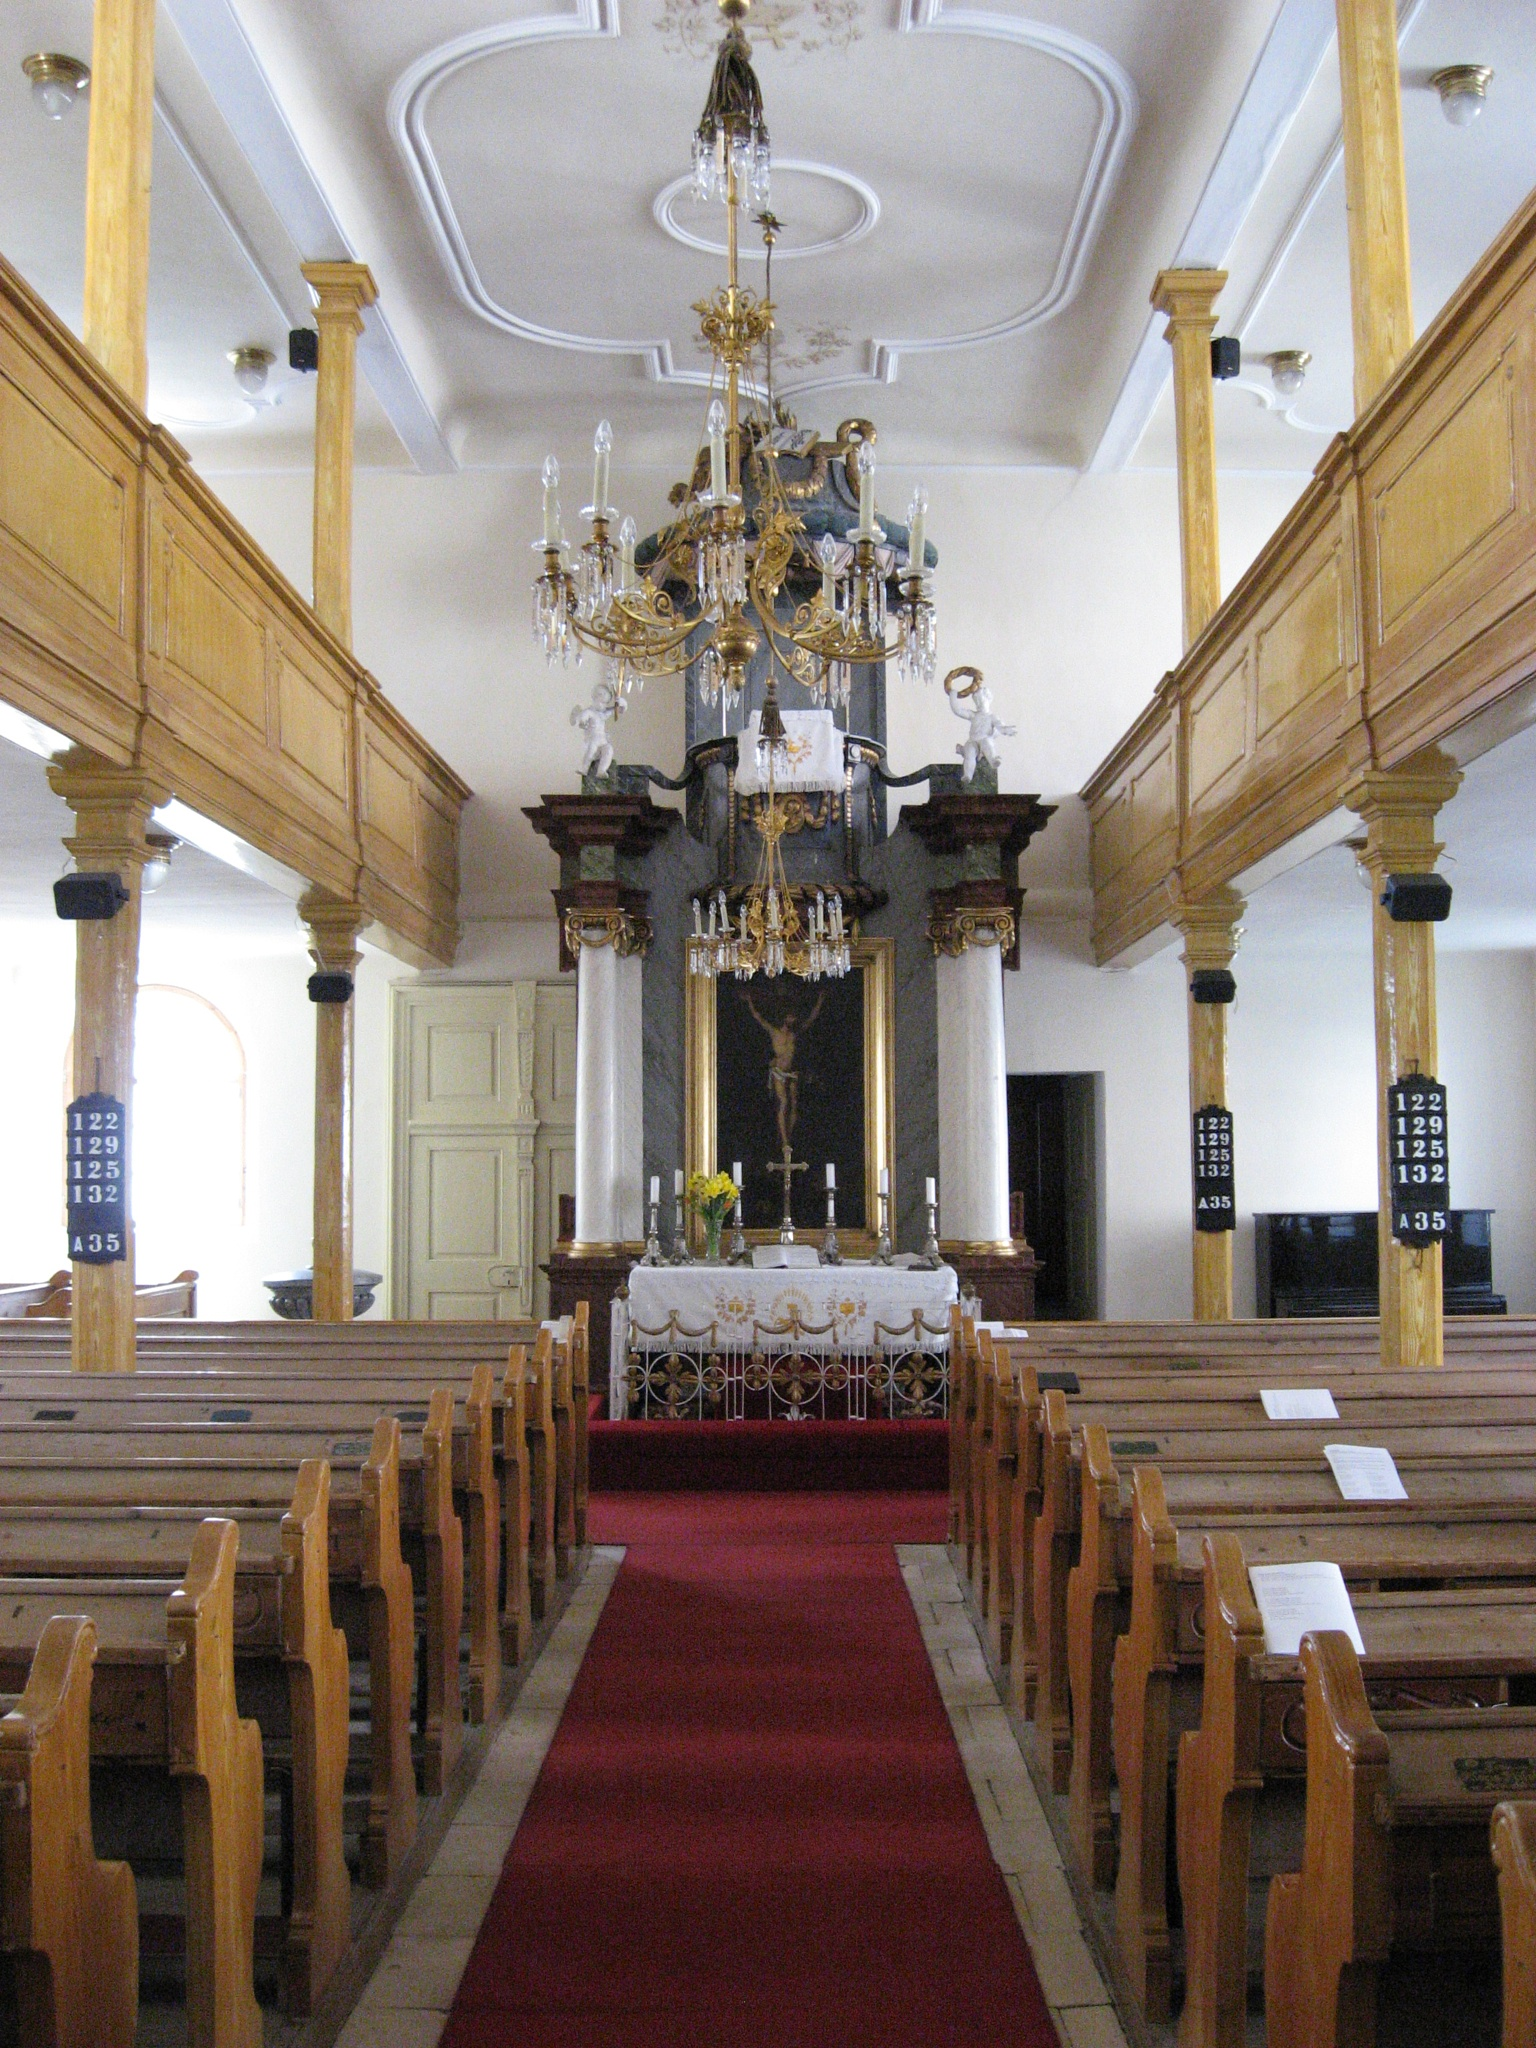 Lutheran Church in Svaty Jur by filiplipinski1